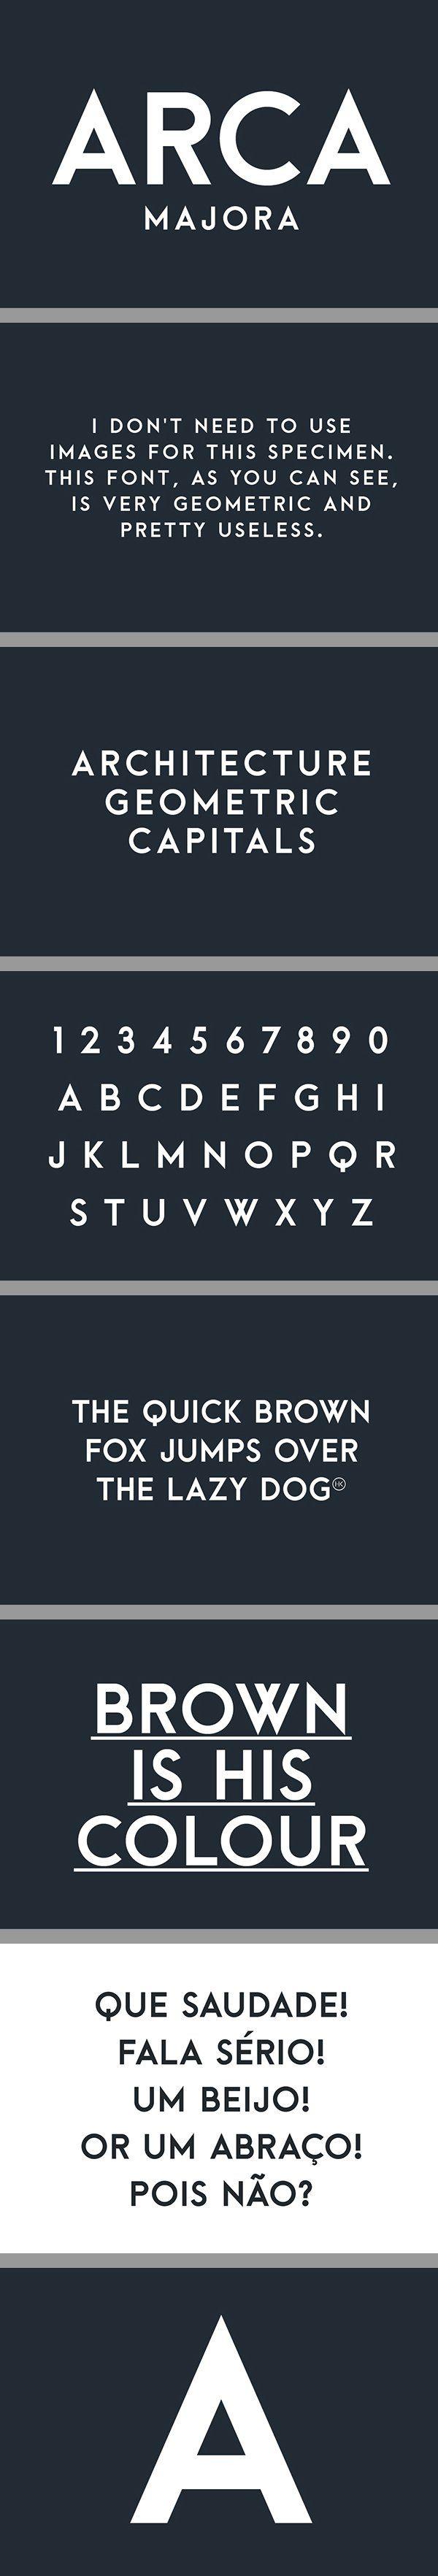 Arca Majora Free Font